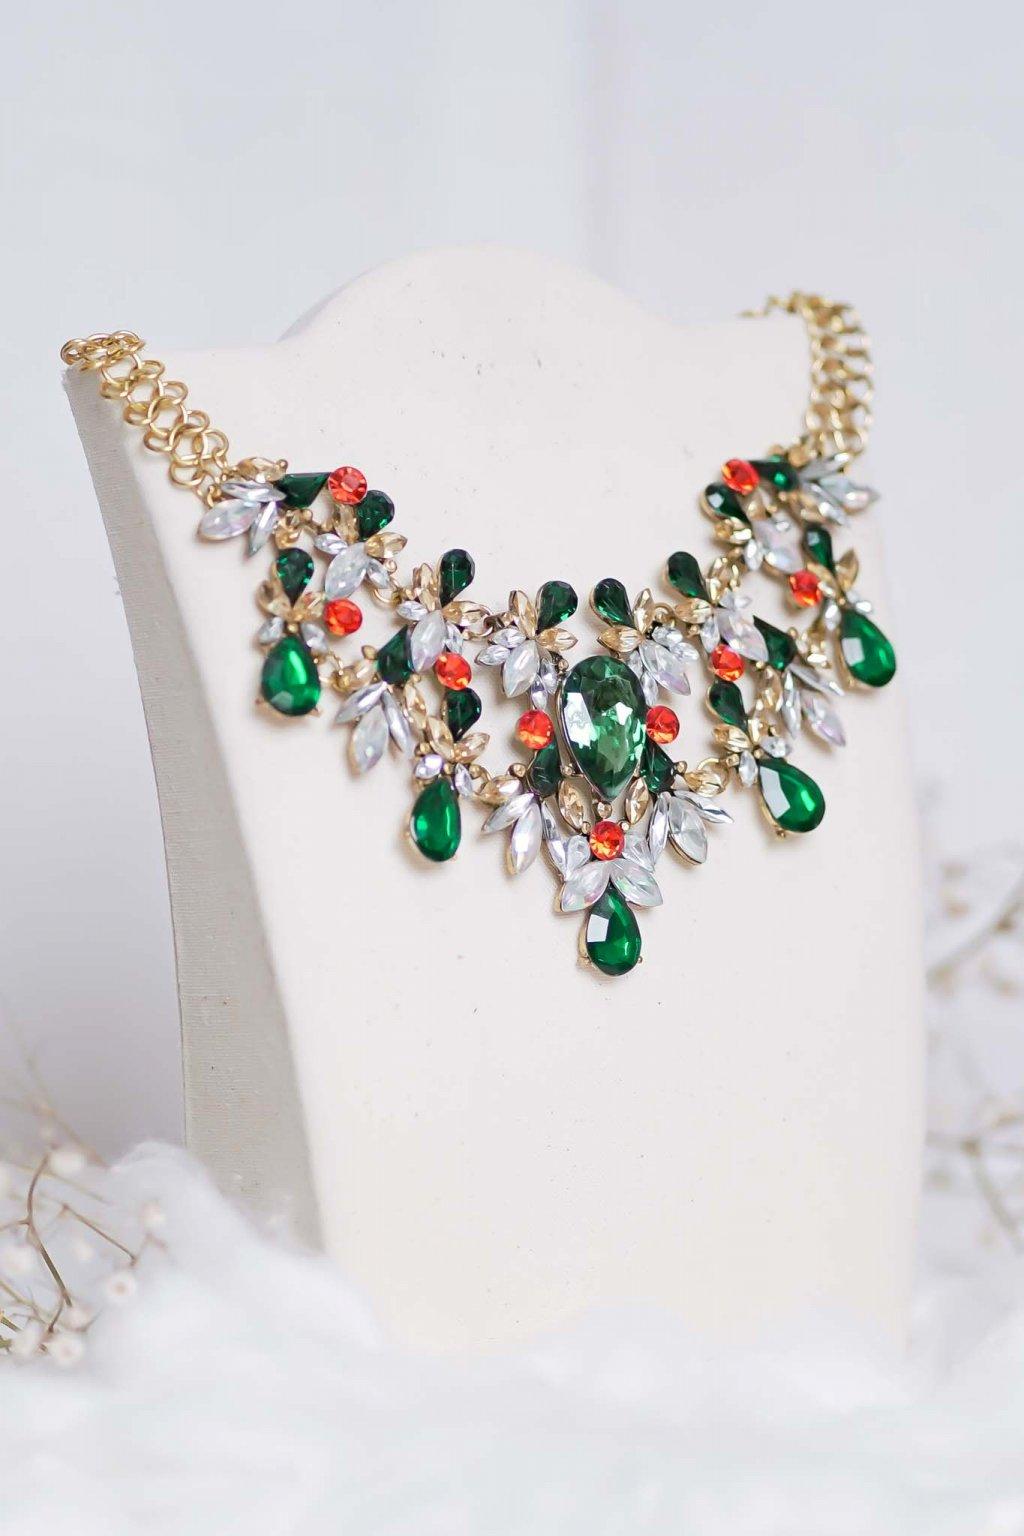 náhrdelník, šperk, spoločenská náhrdelník, náhrdelník na bežný deň, výrazný náhrdelník, jemný náhrdelník, šperky, náhrdelník na ples, svadbu, stužkovú 78